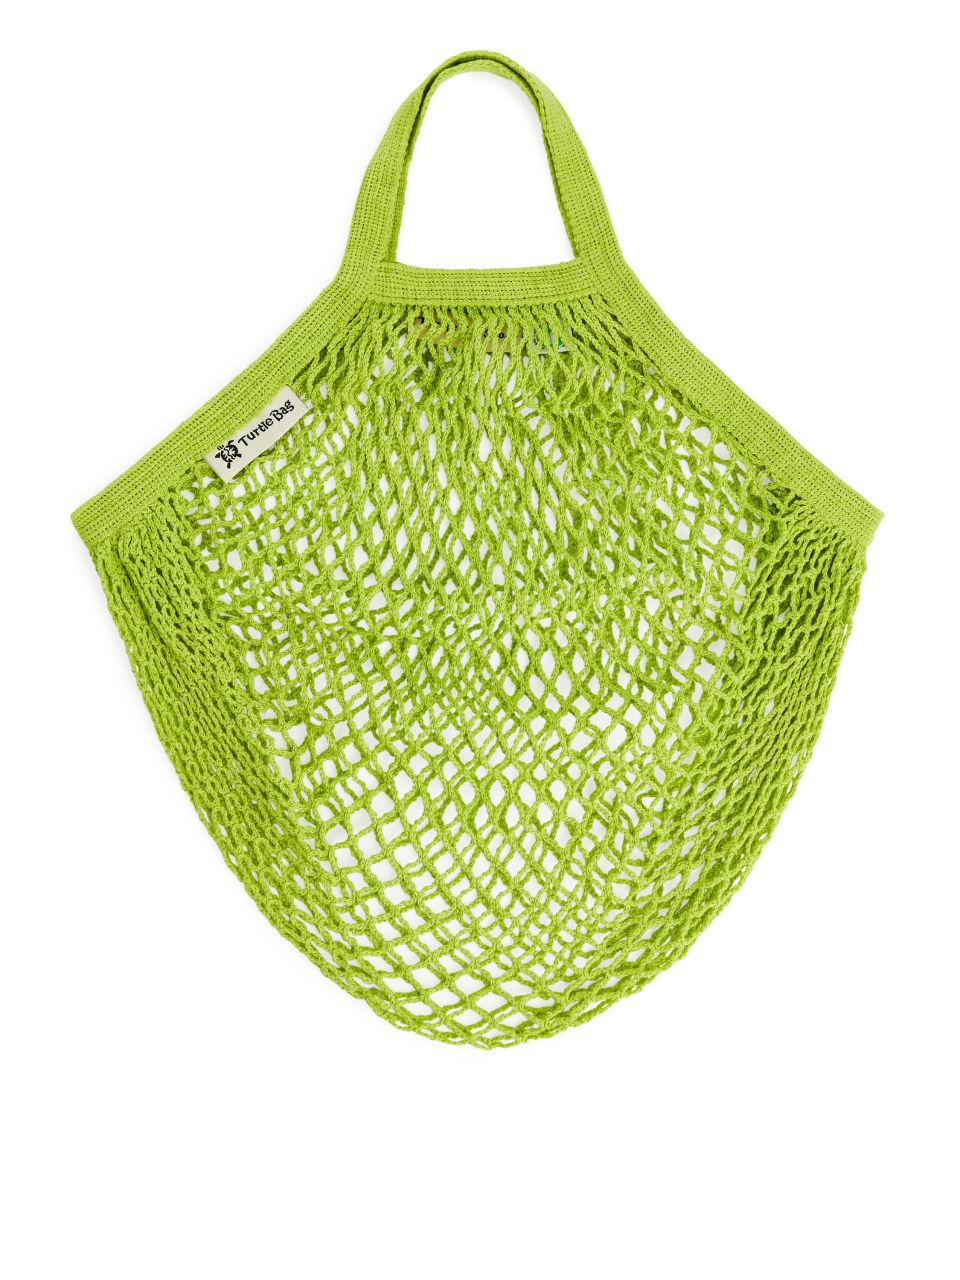 Turtle Bags String Bag - Green